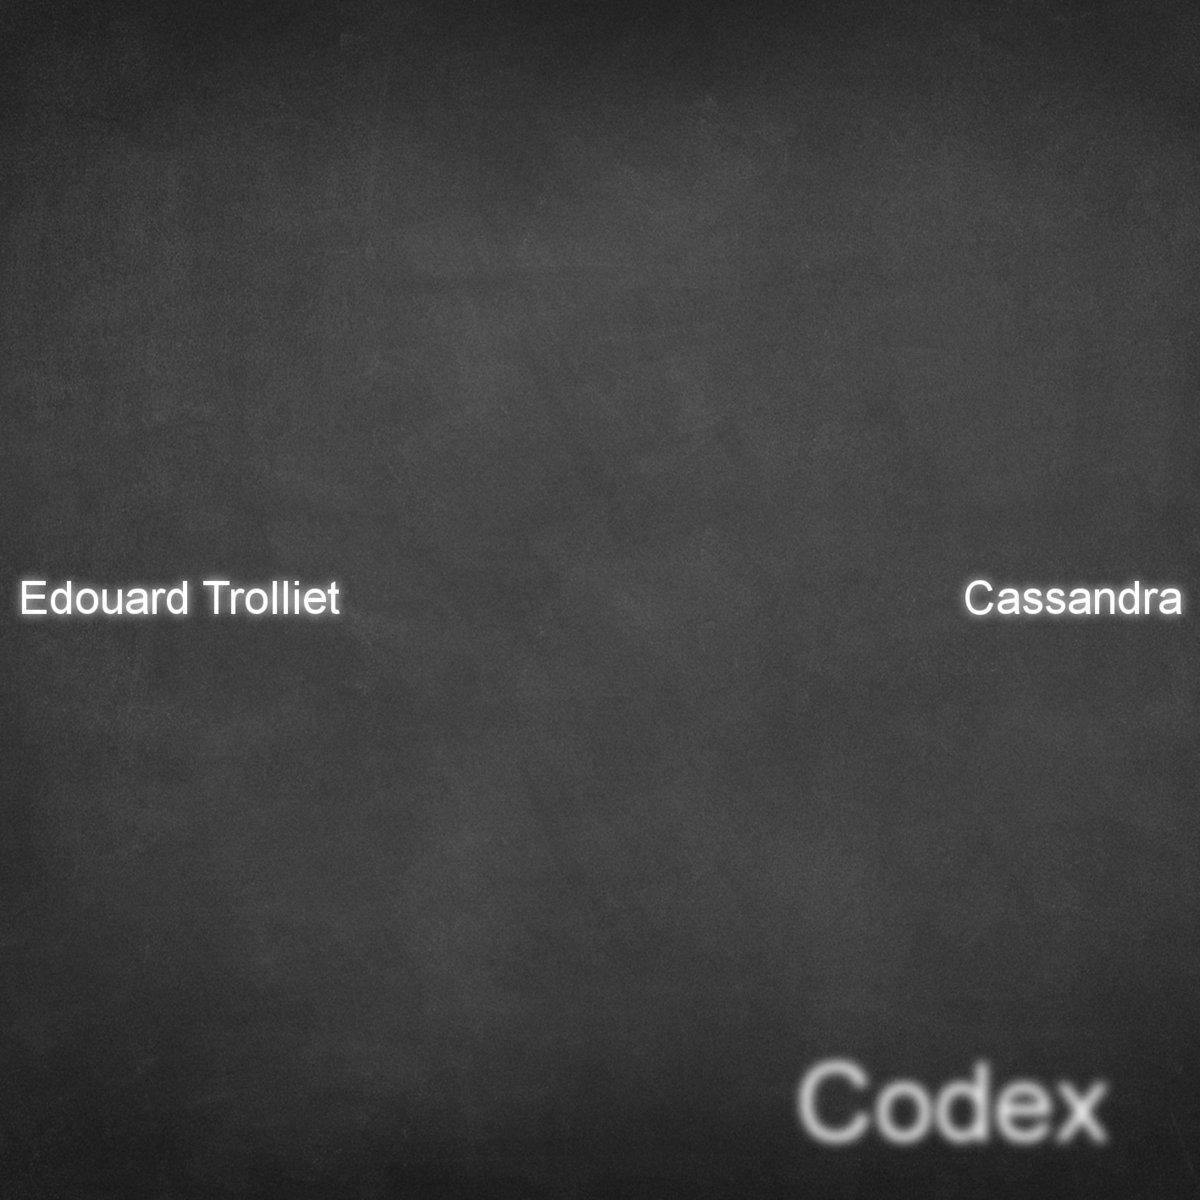 https://dhaturarecords.bandcamp.com/album/cassandra